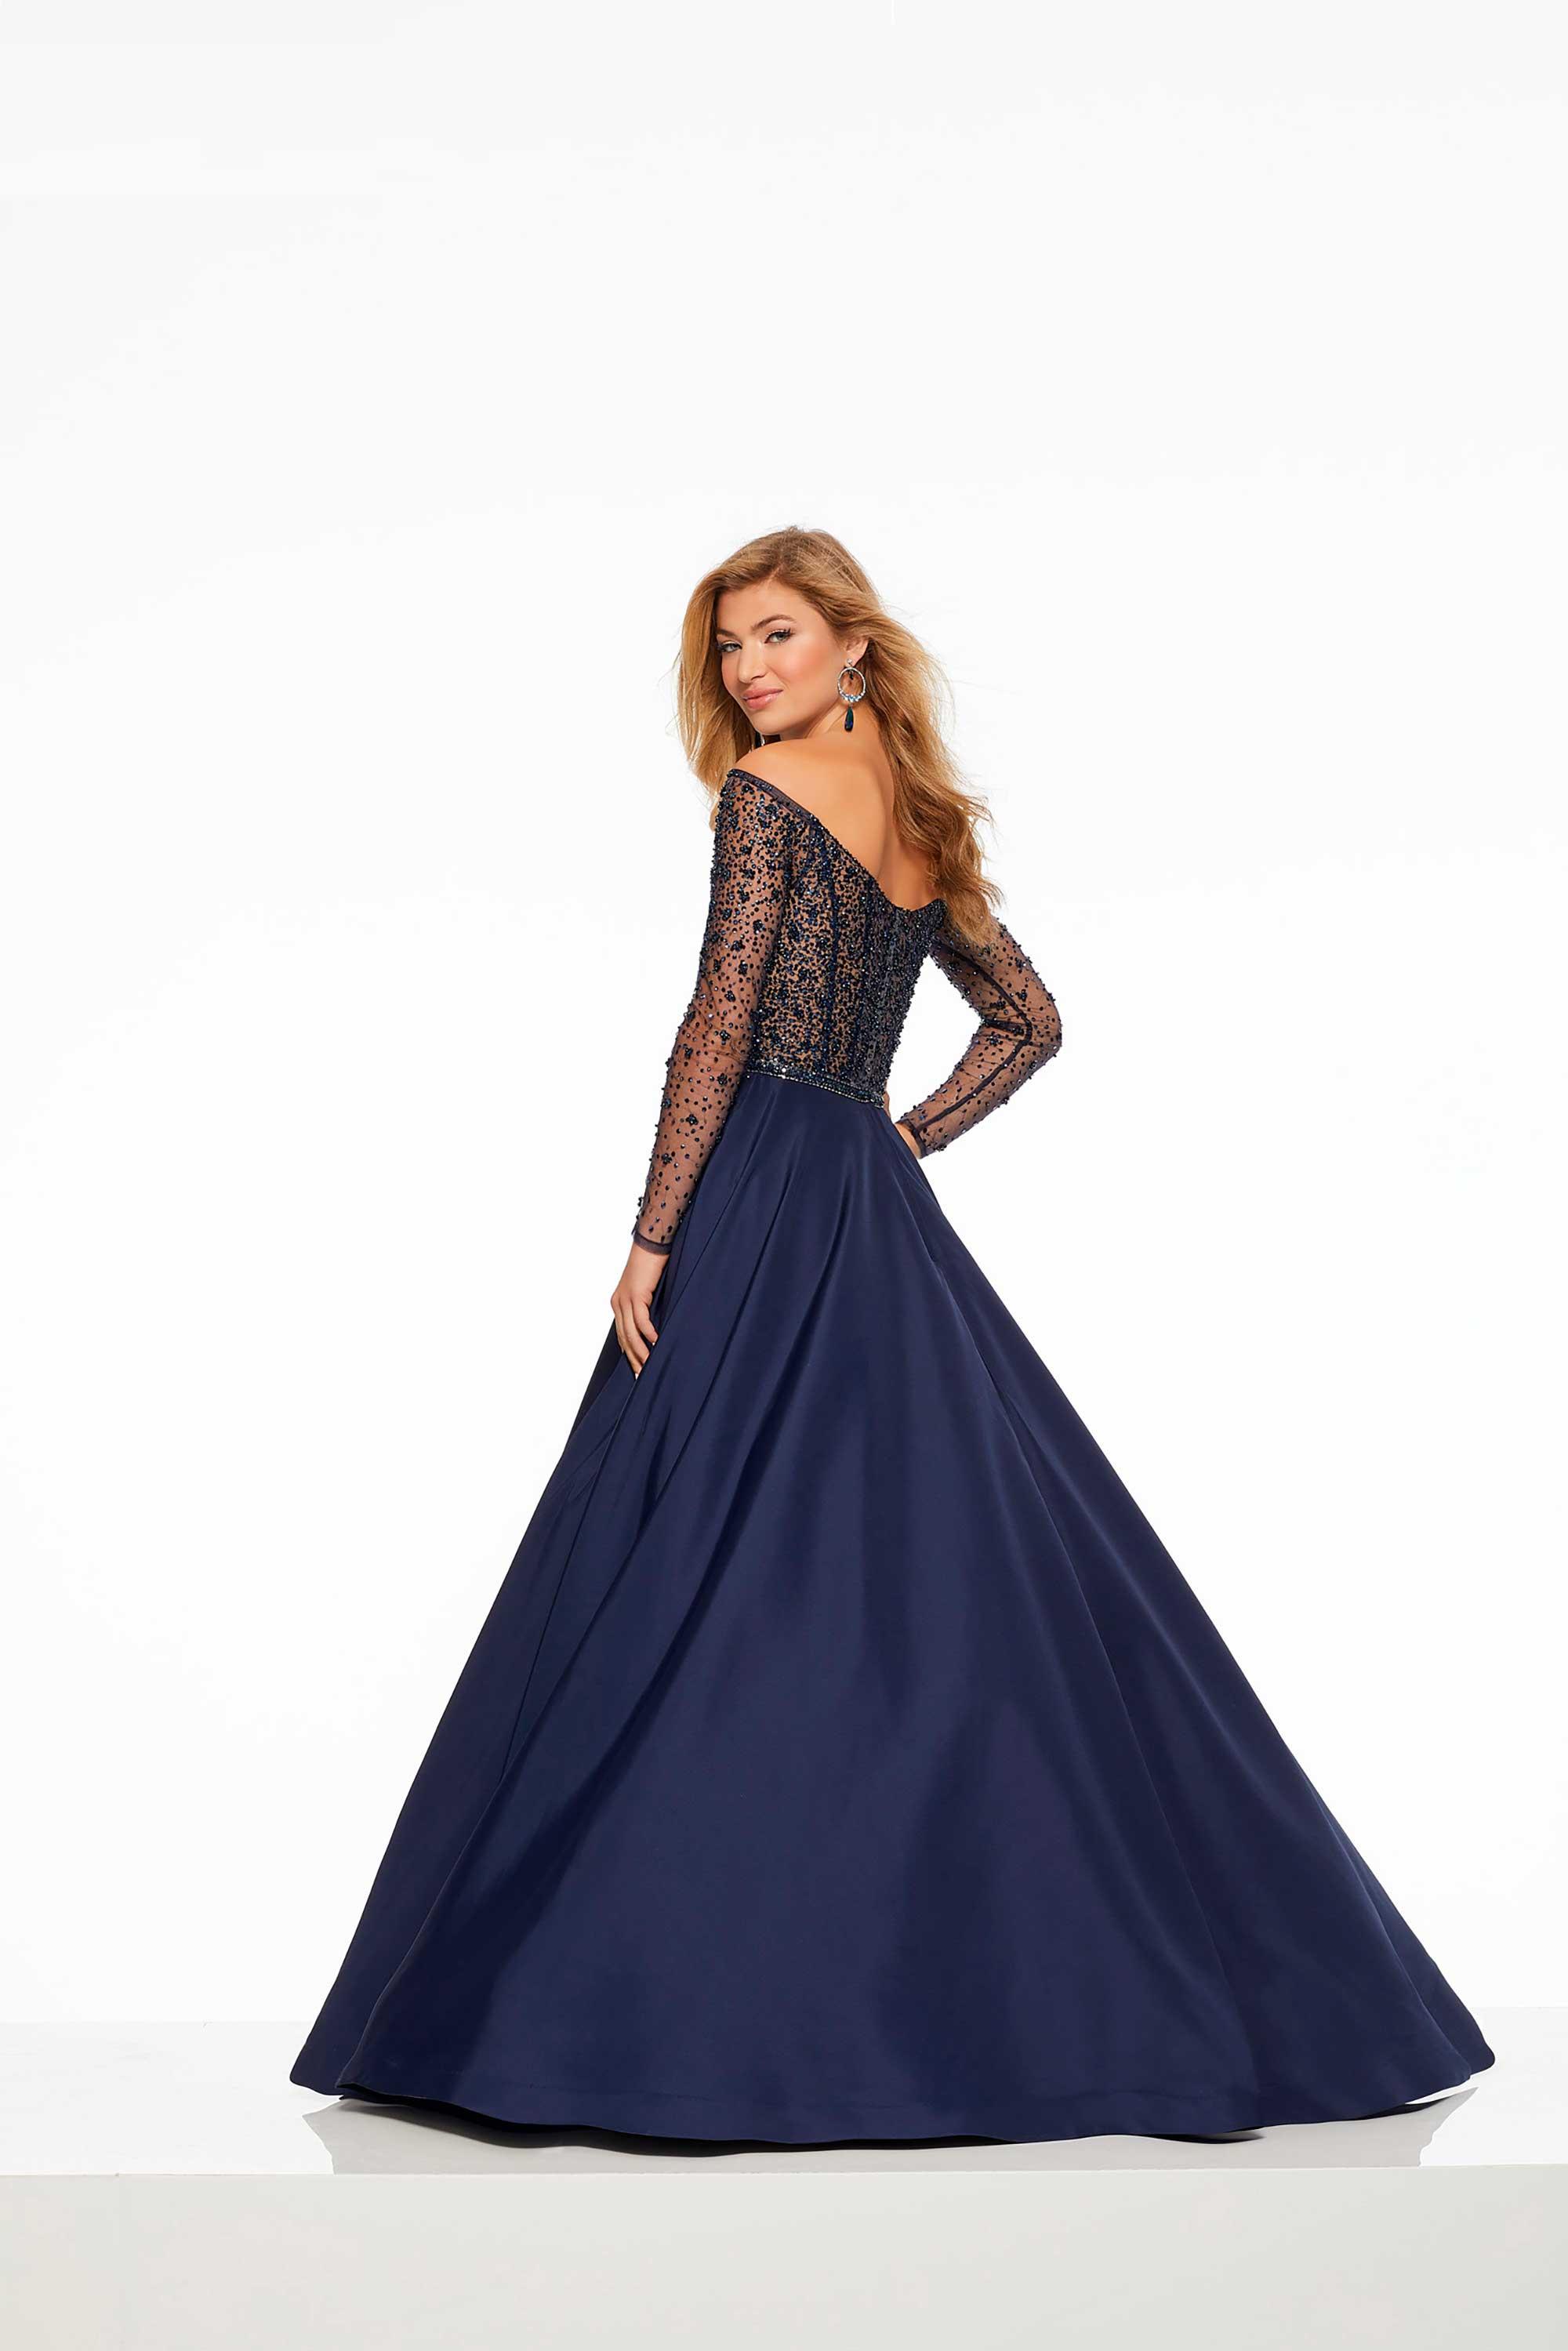 Vestido Lucía Fiesta 2019 mod. 43031 - 6